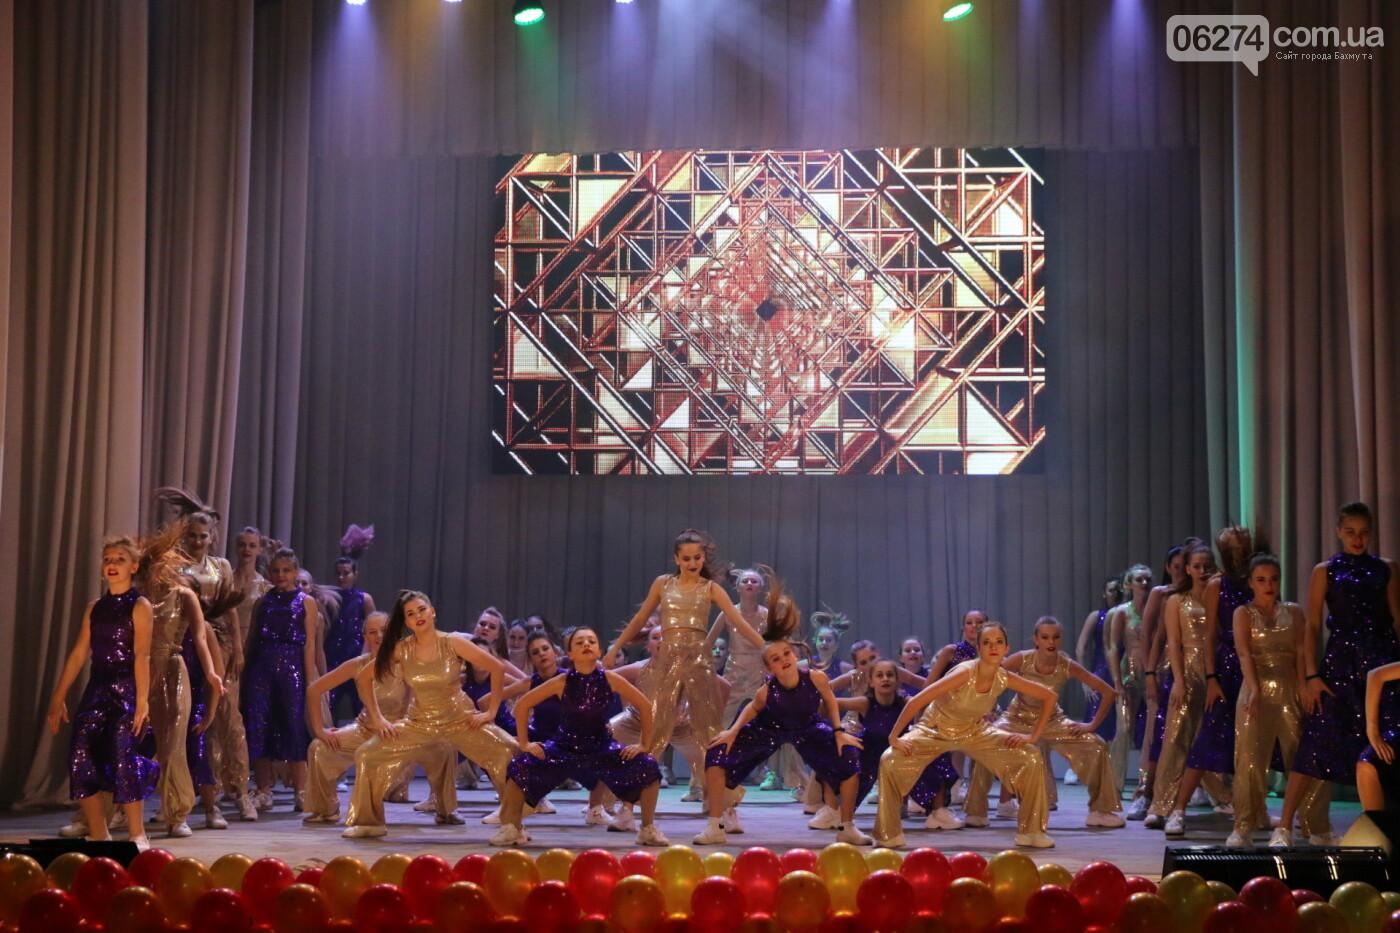 В Бахмуте провели Disco House Party (ФОТООТЧЕТ), фото-14